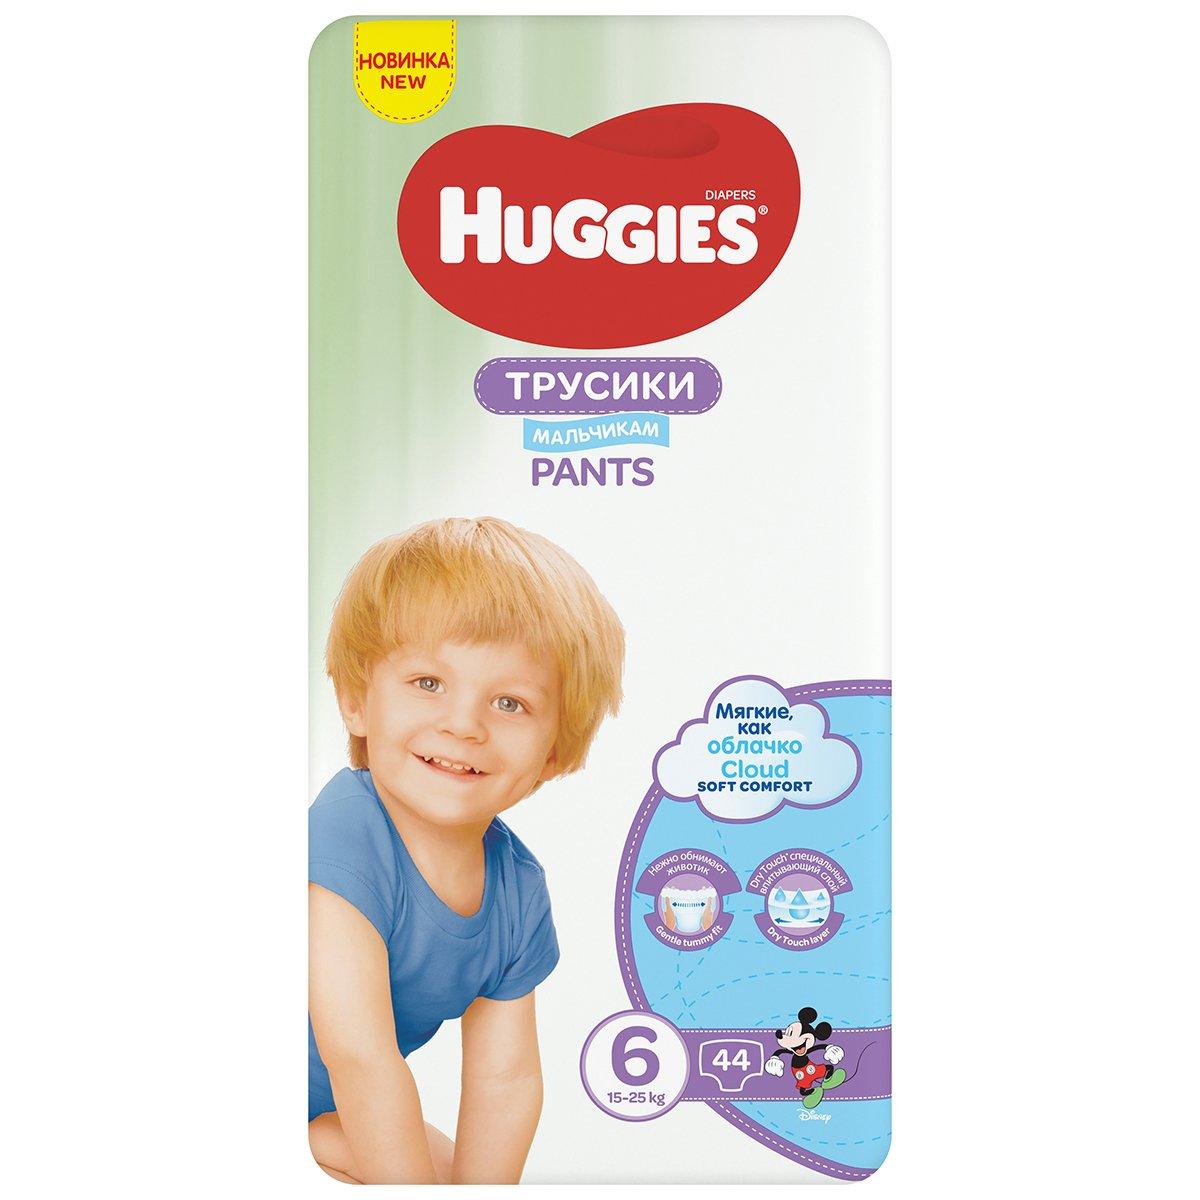 Scutece chilotel Huggies Pants Mega, Nr 6, Boys, 44 Buc, 15-25 Kg imagine